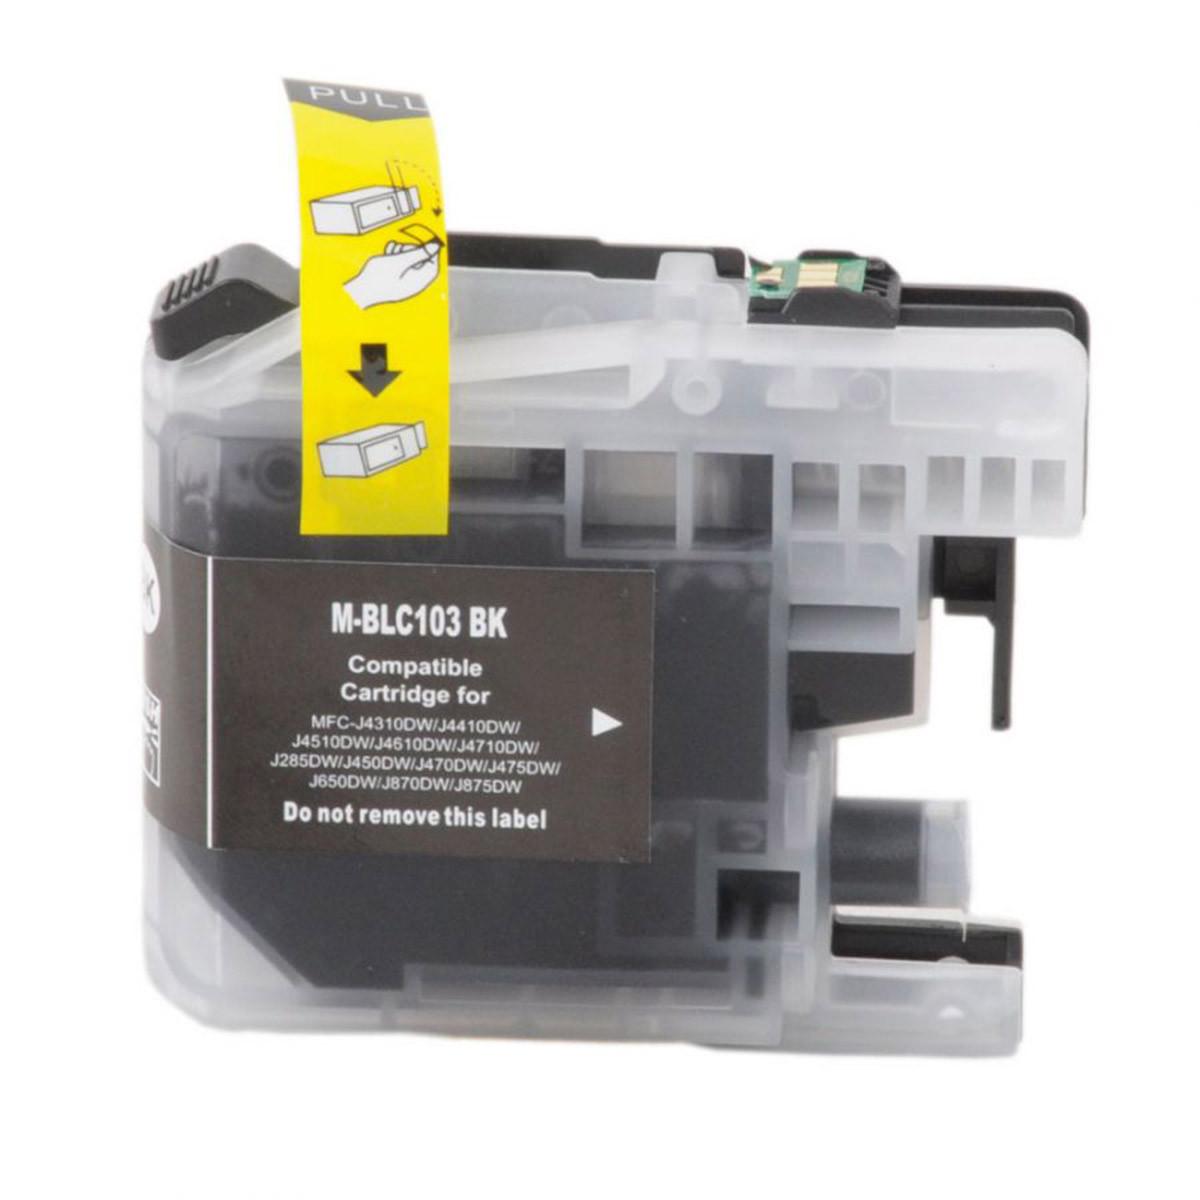 Cartucho de Tinta Compatível com Brother LC-103BK LC-109BK Preto | 6520DW 6920DW 6720DW 6520DW 20ml